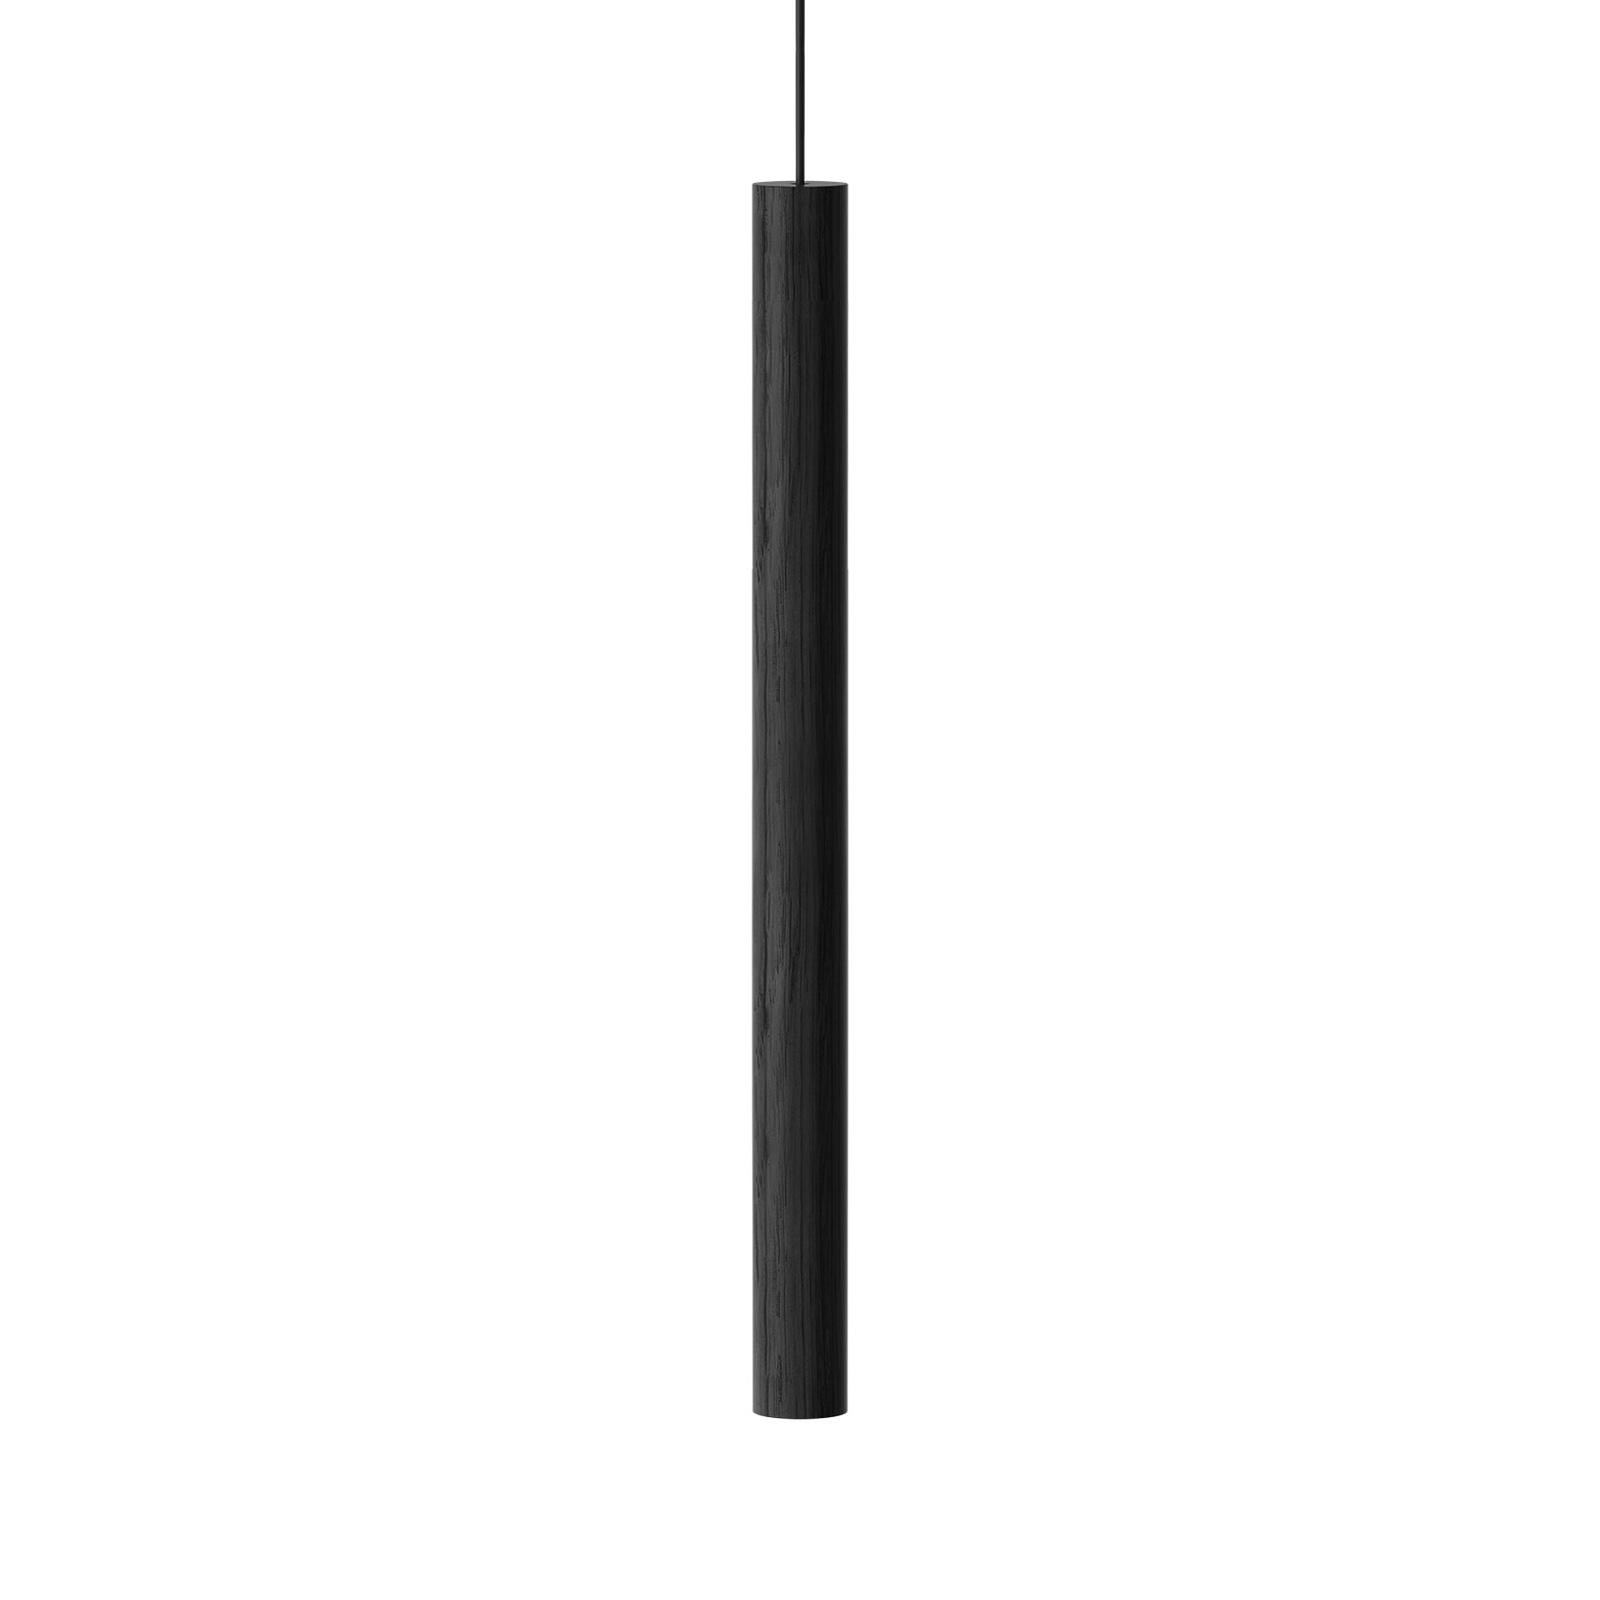 UMAGE Chimes Tall lámpara colgante LED roble negro